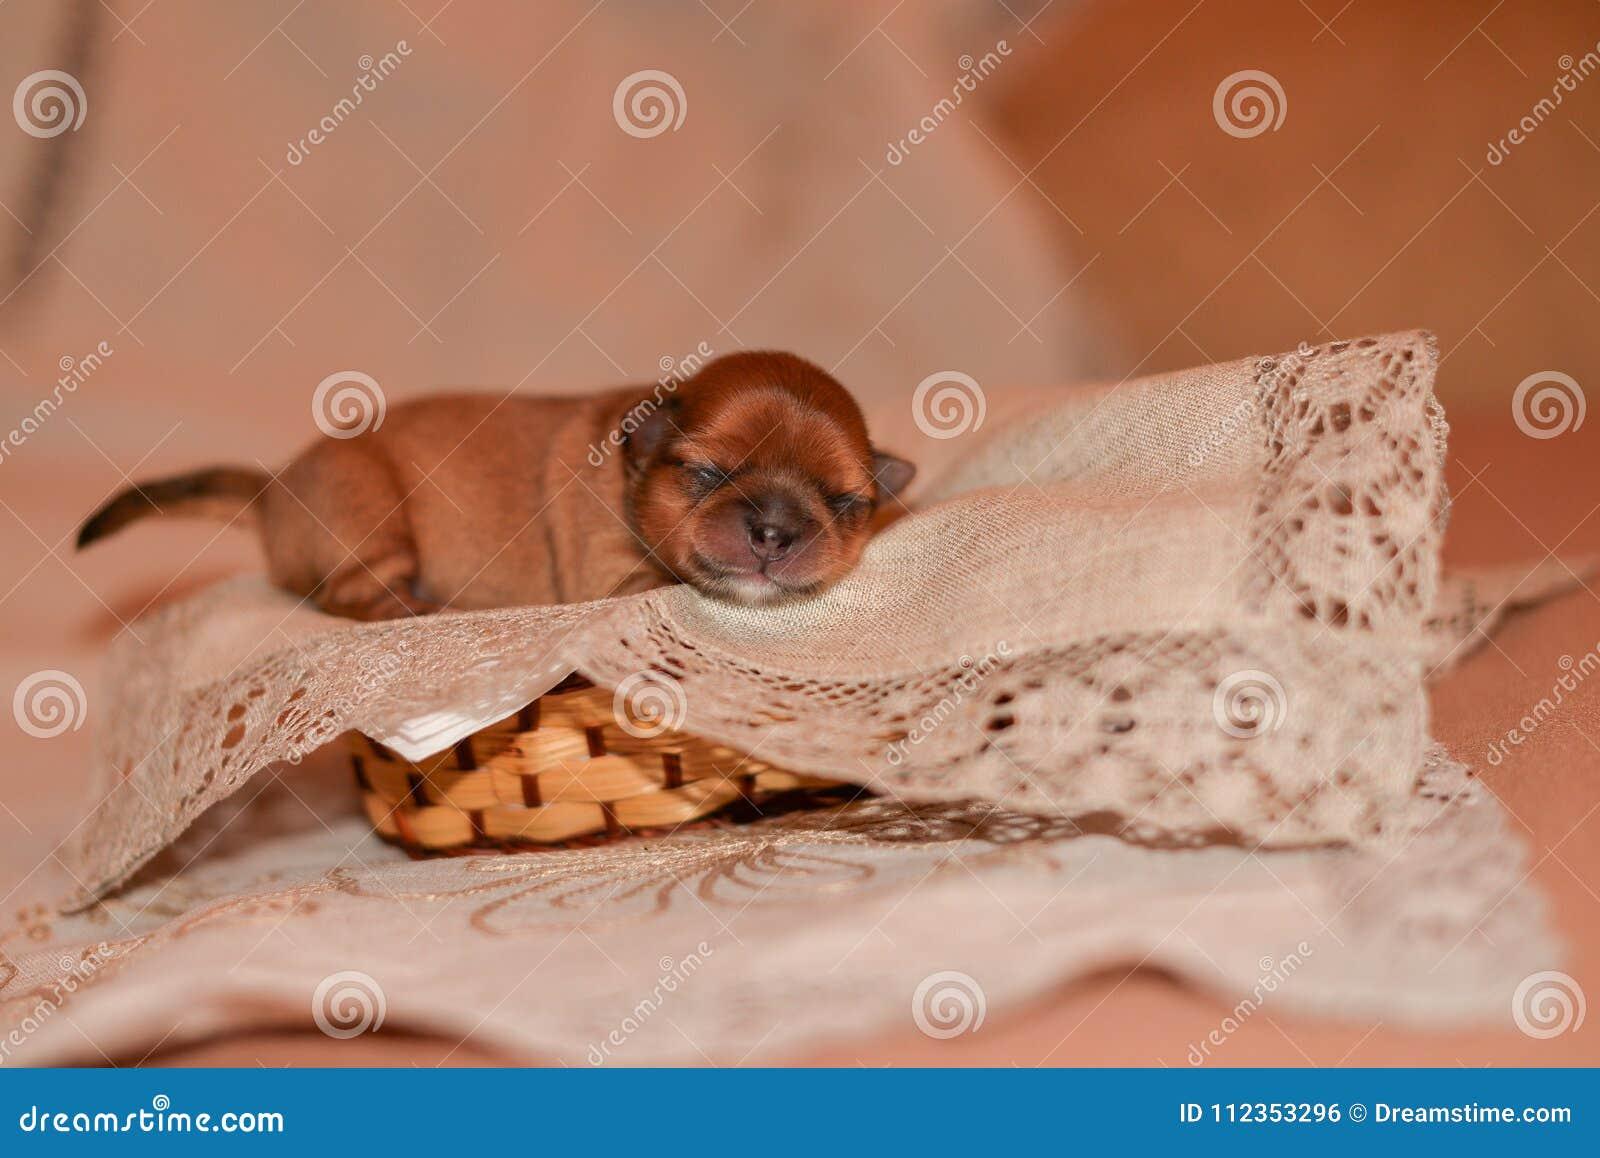 Newborn Puppy Stock Photo Image Of Happy Puppy Care 112353296